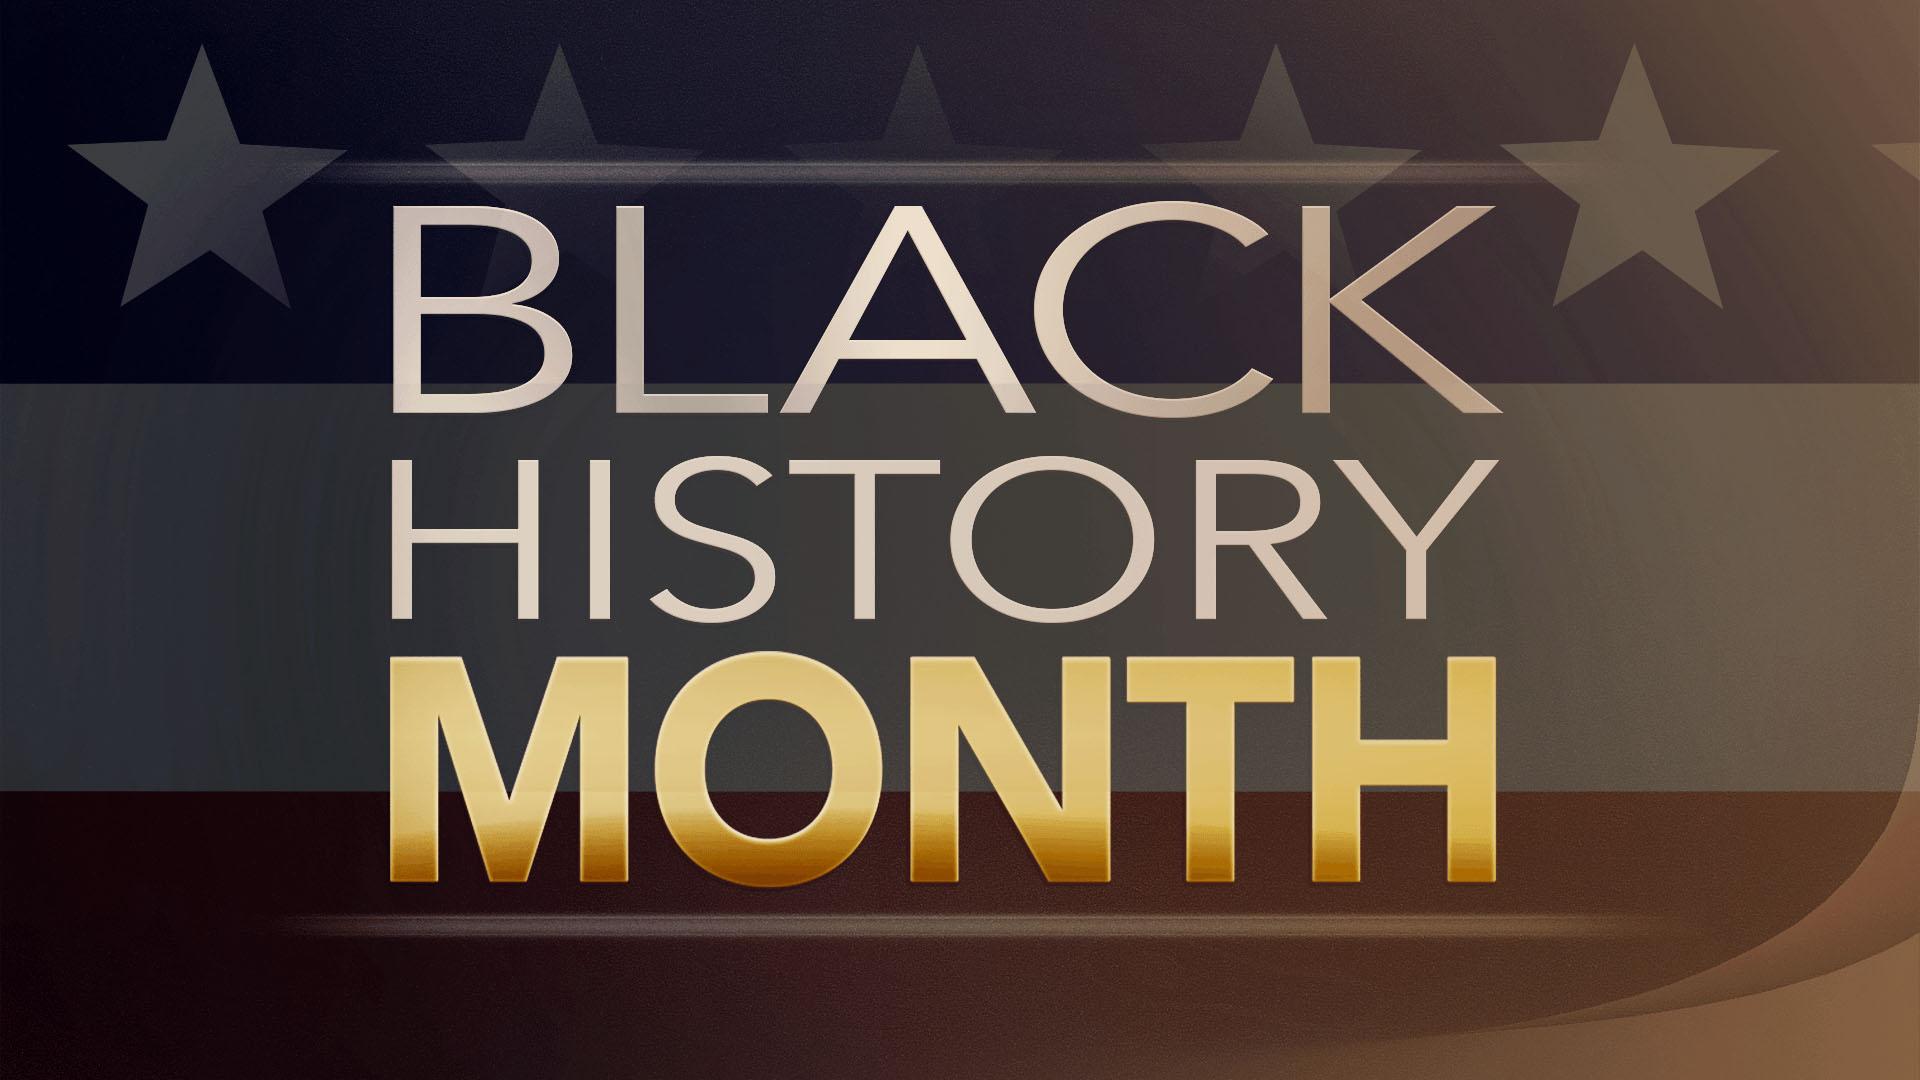 Black History Month February Digital Signage Graphic 2